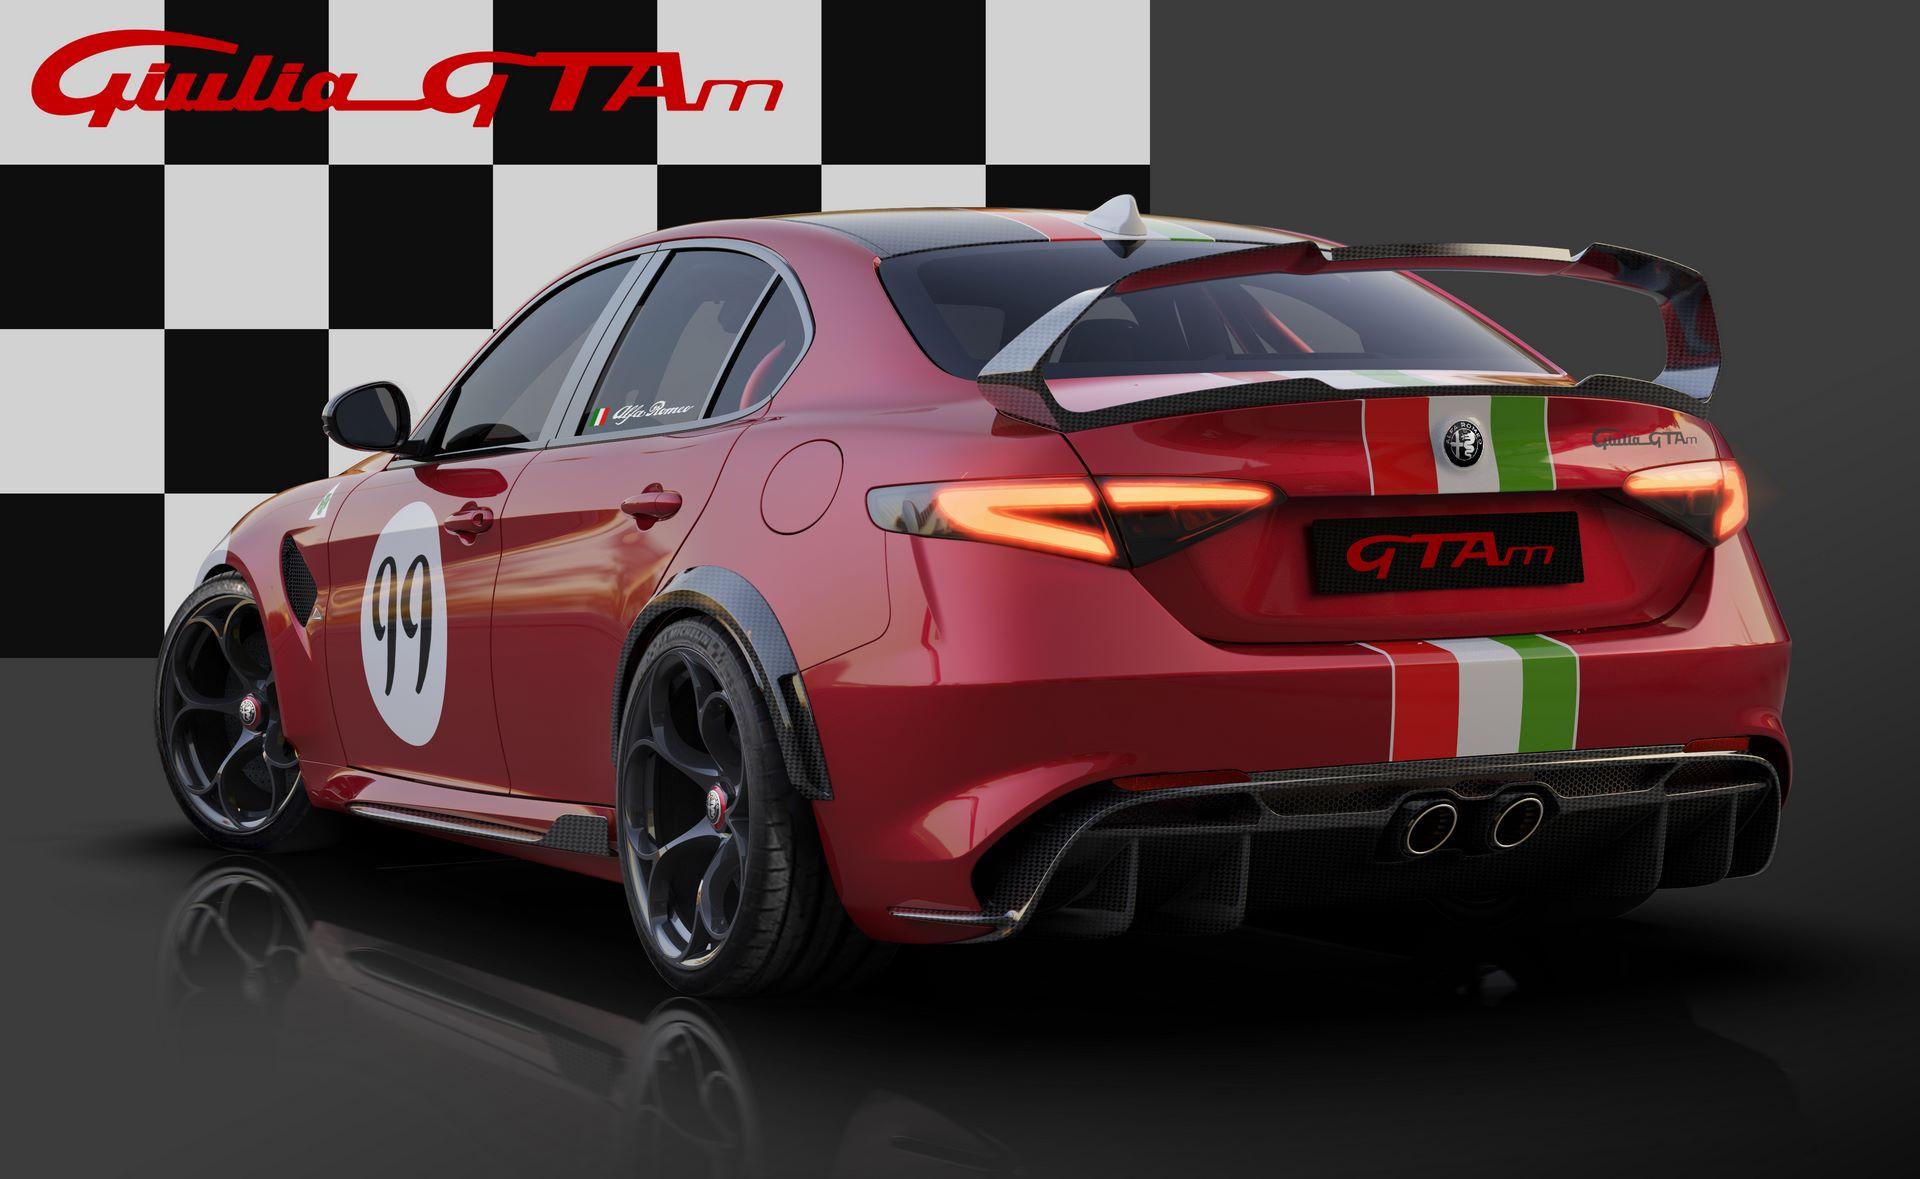 19_Alfa-Romeo-Giulia-GTA-dedicated-Livery